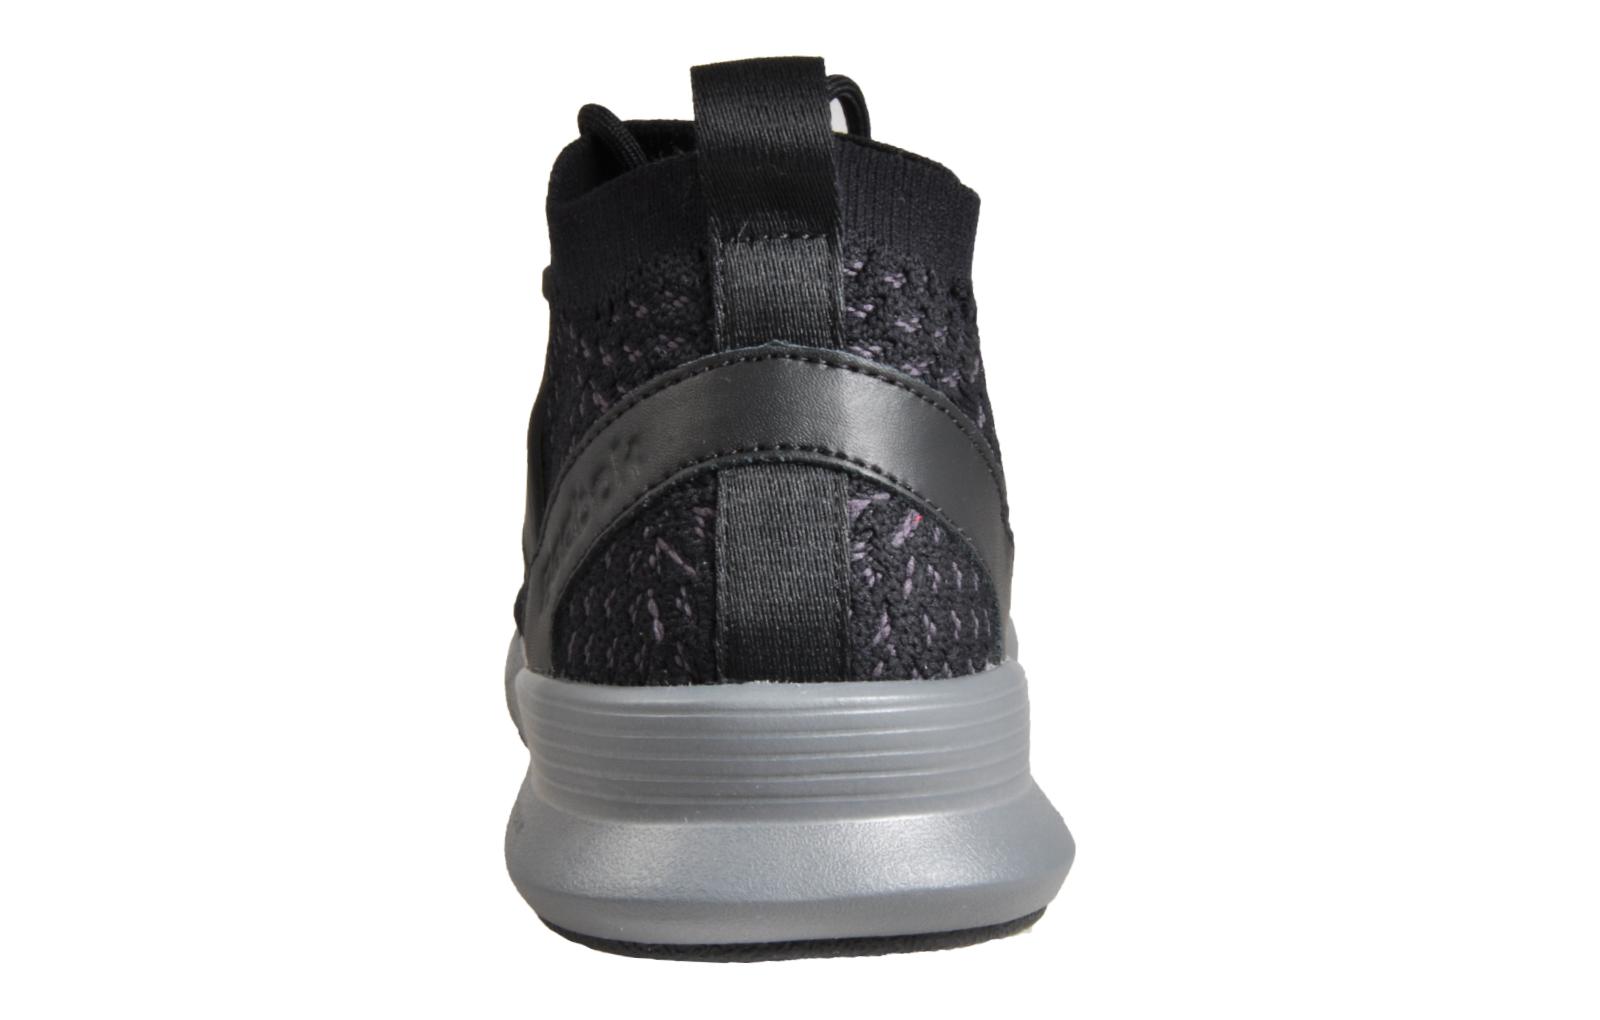 a620733a5c40b2 Reebok Classics ZOKU Runner Ultraknit IS Men s Running Shoes Casual Gym  Trainers Black